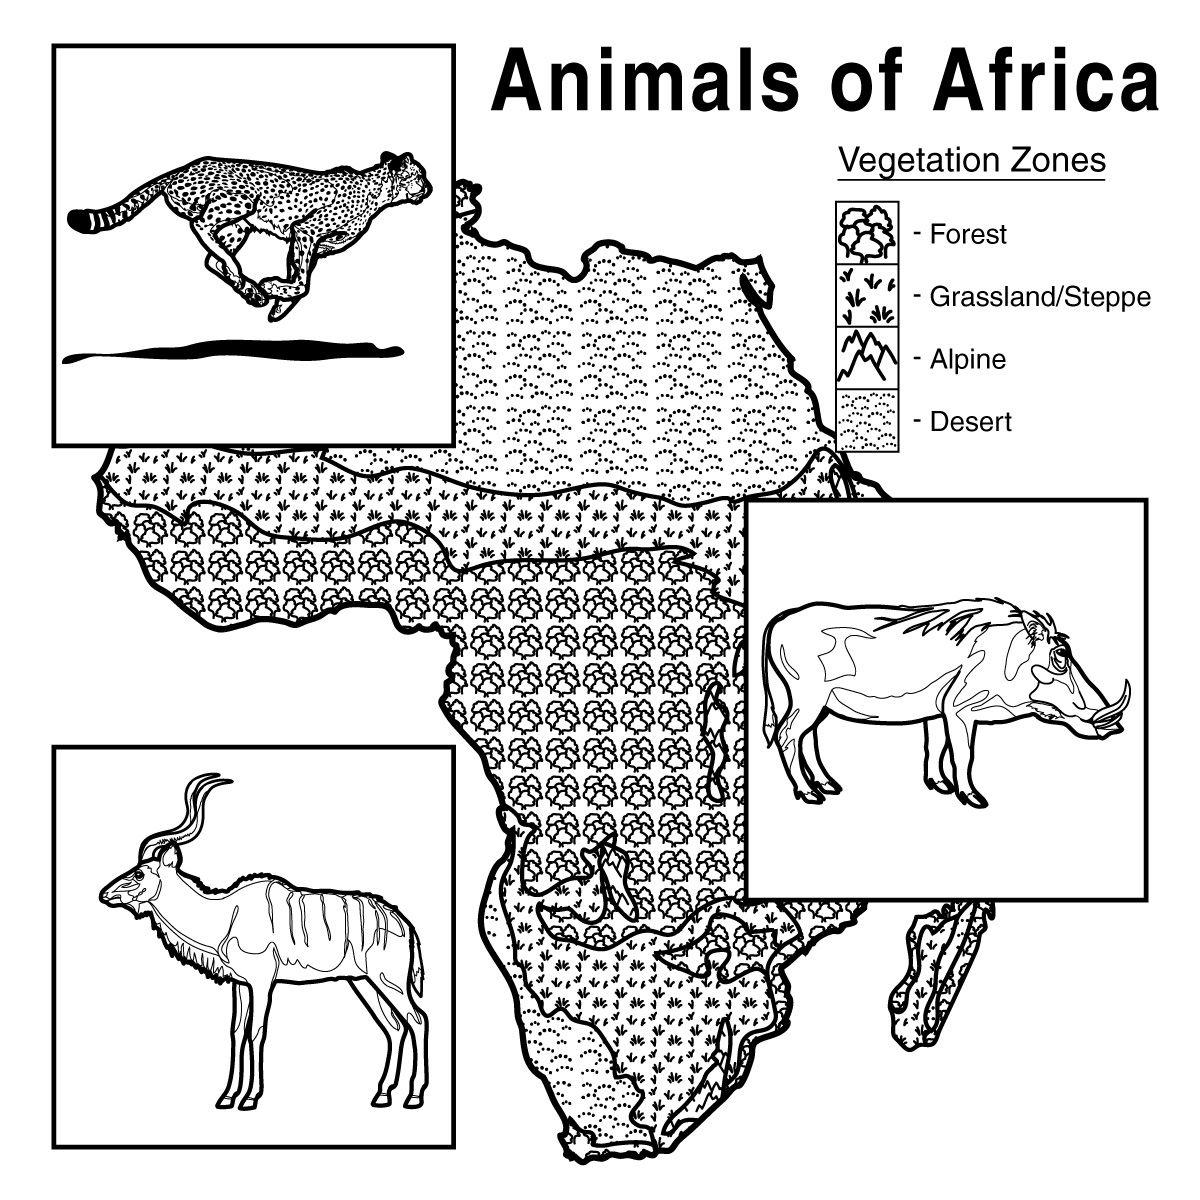 African Animals With Habitat Vegetation Zone Chart